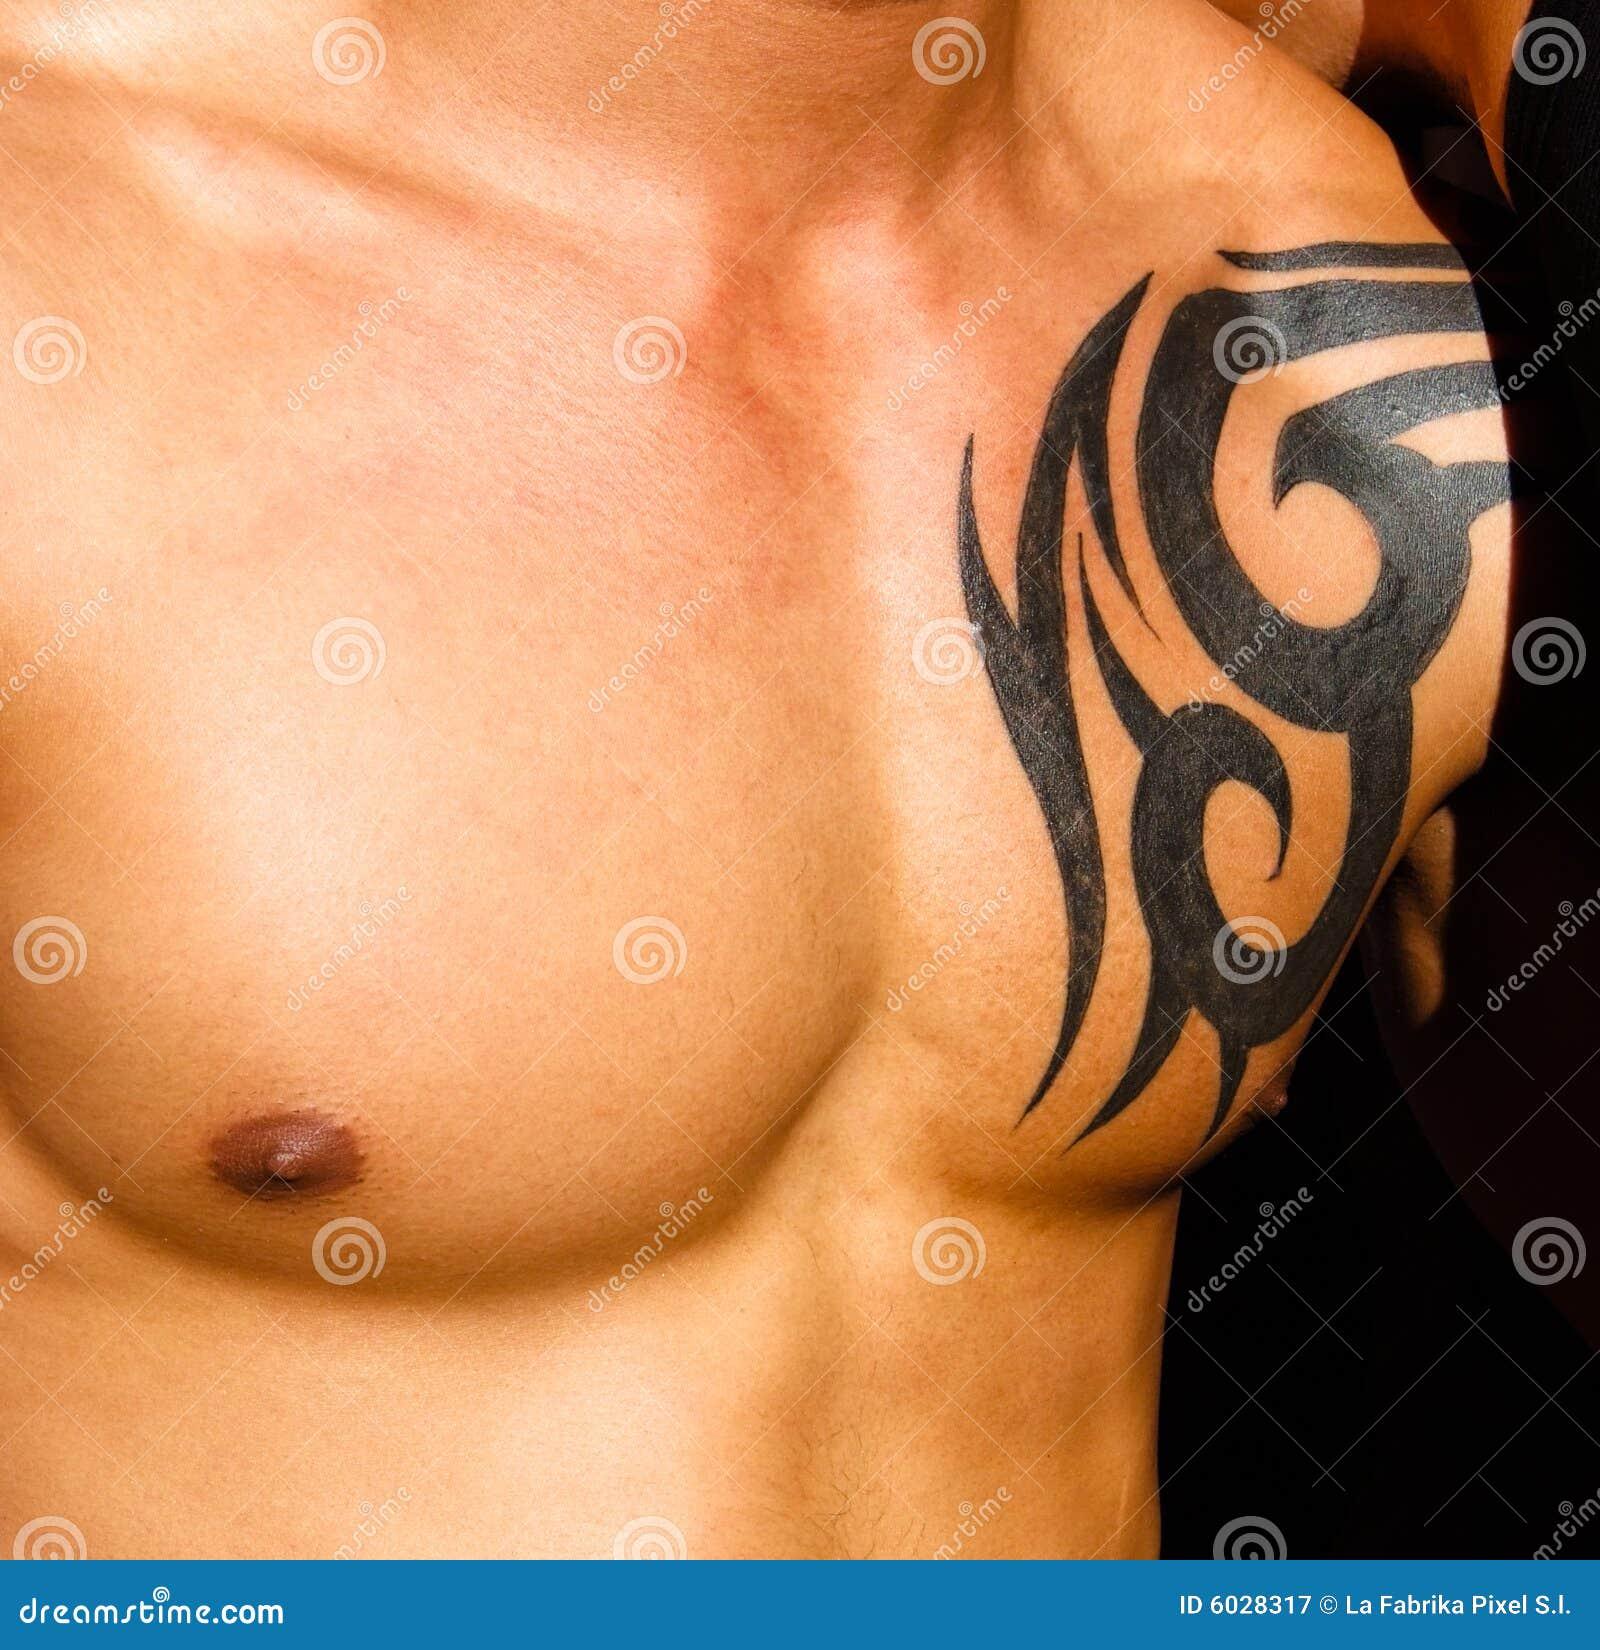 Tatouage homme torse - Torse M Le Avec Le Tatouage